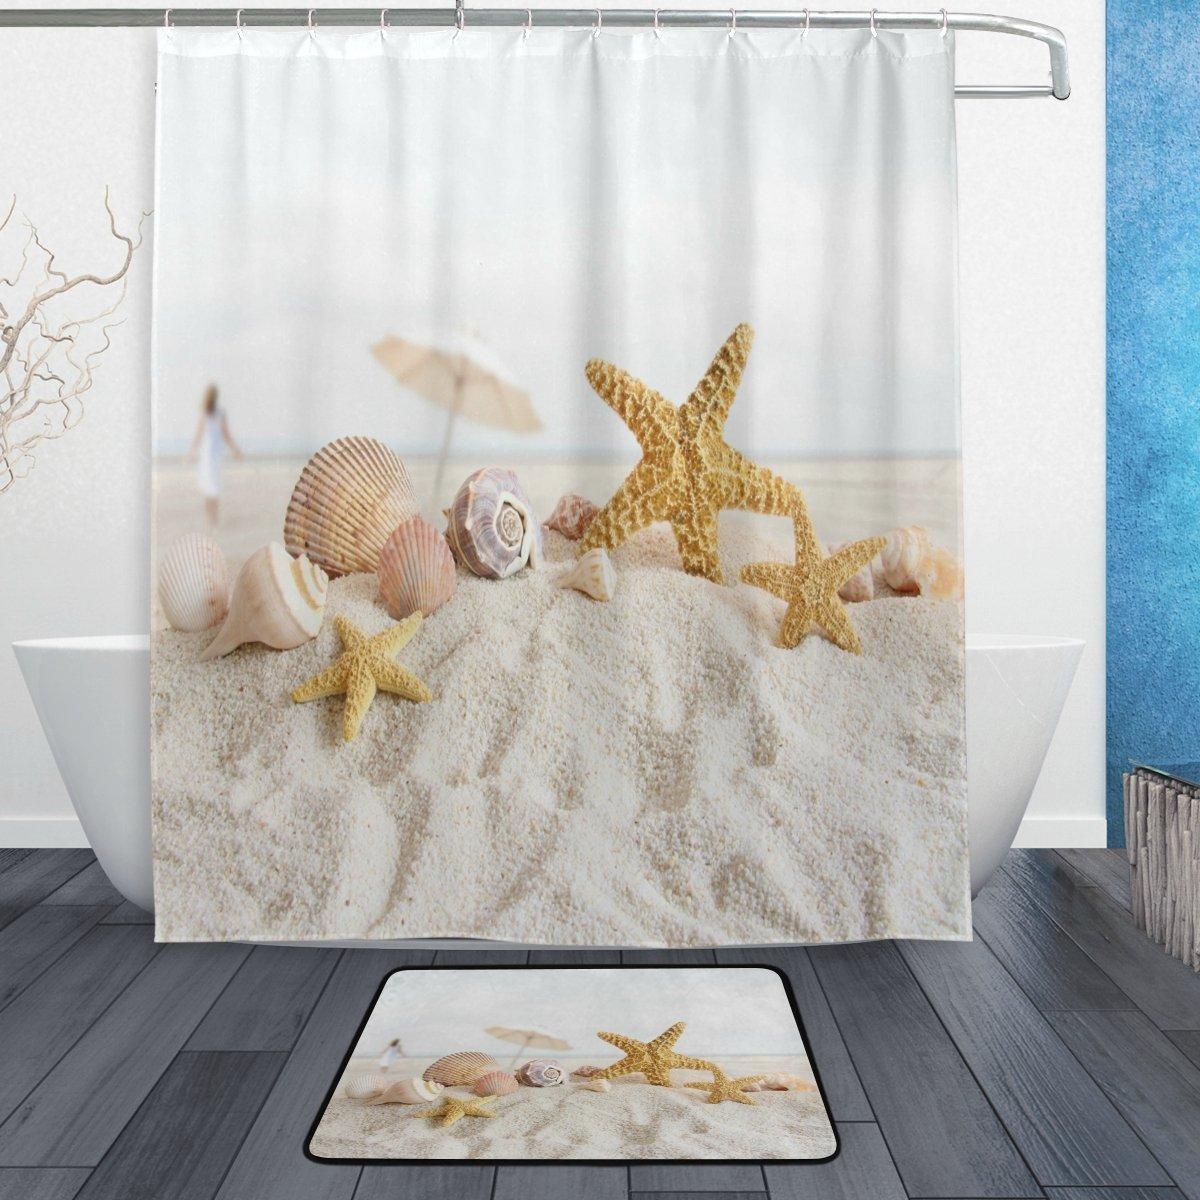 Us 16 55 31 Off Ocean Beach Sea Theme Shower Curtain And Mat Set Starfish Seashell Waterproof Fabric Bathroom Curtain Modern In Shower Curtains